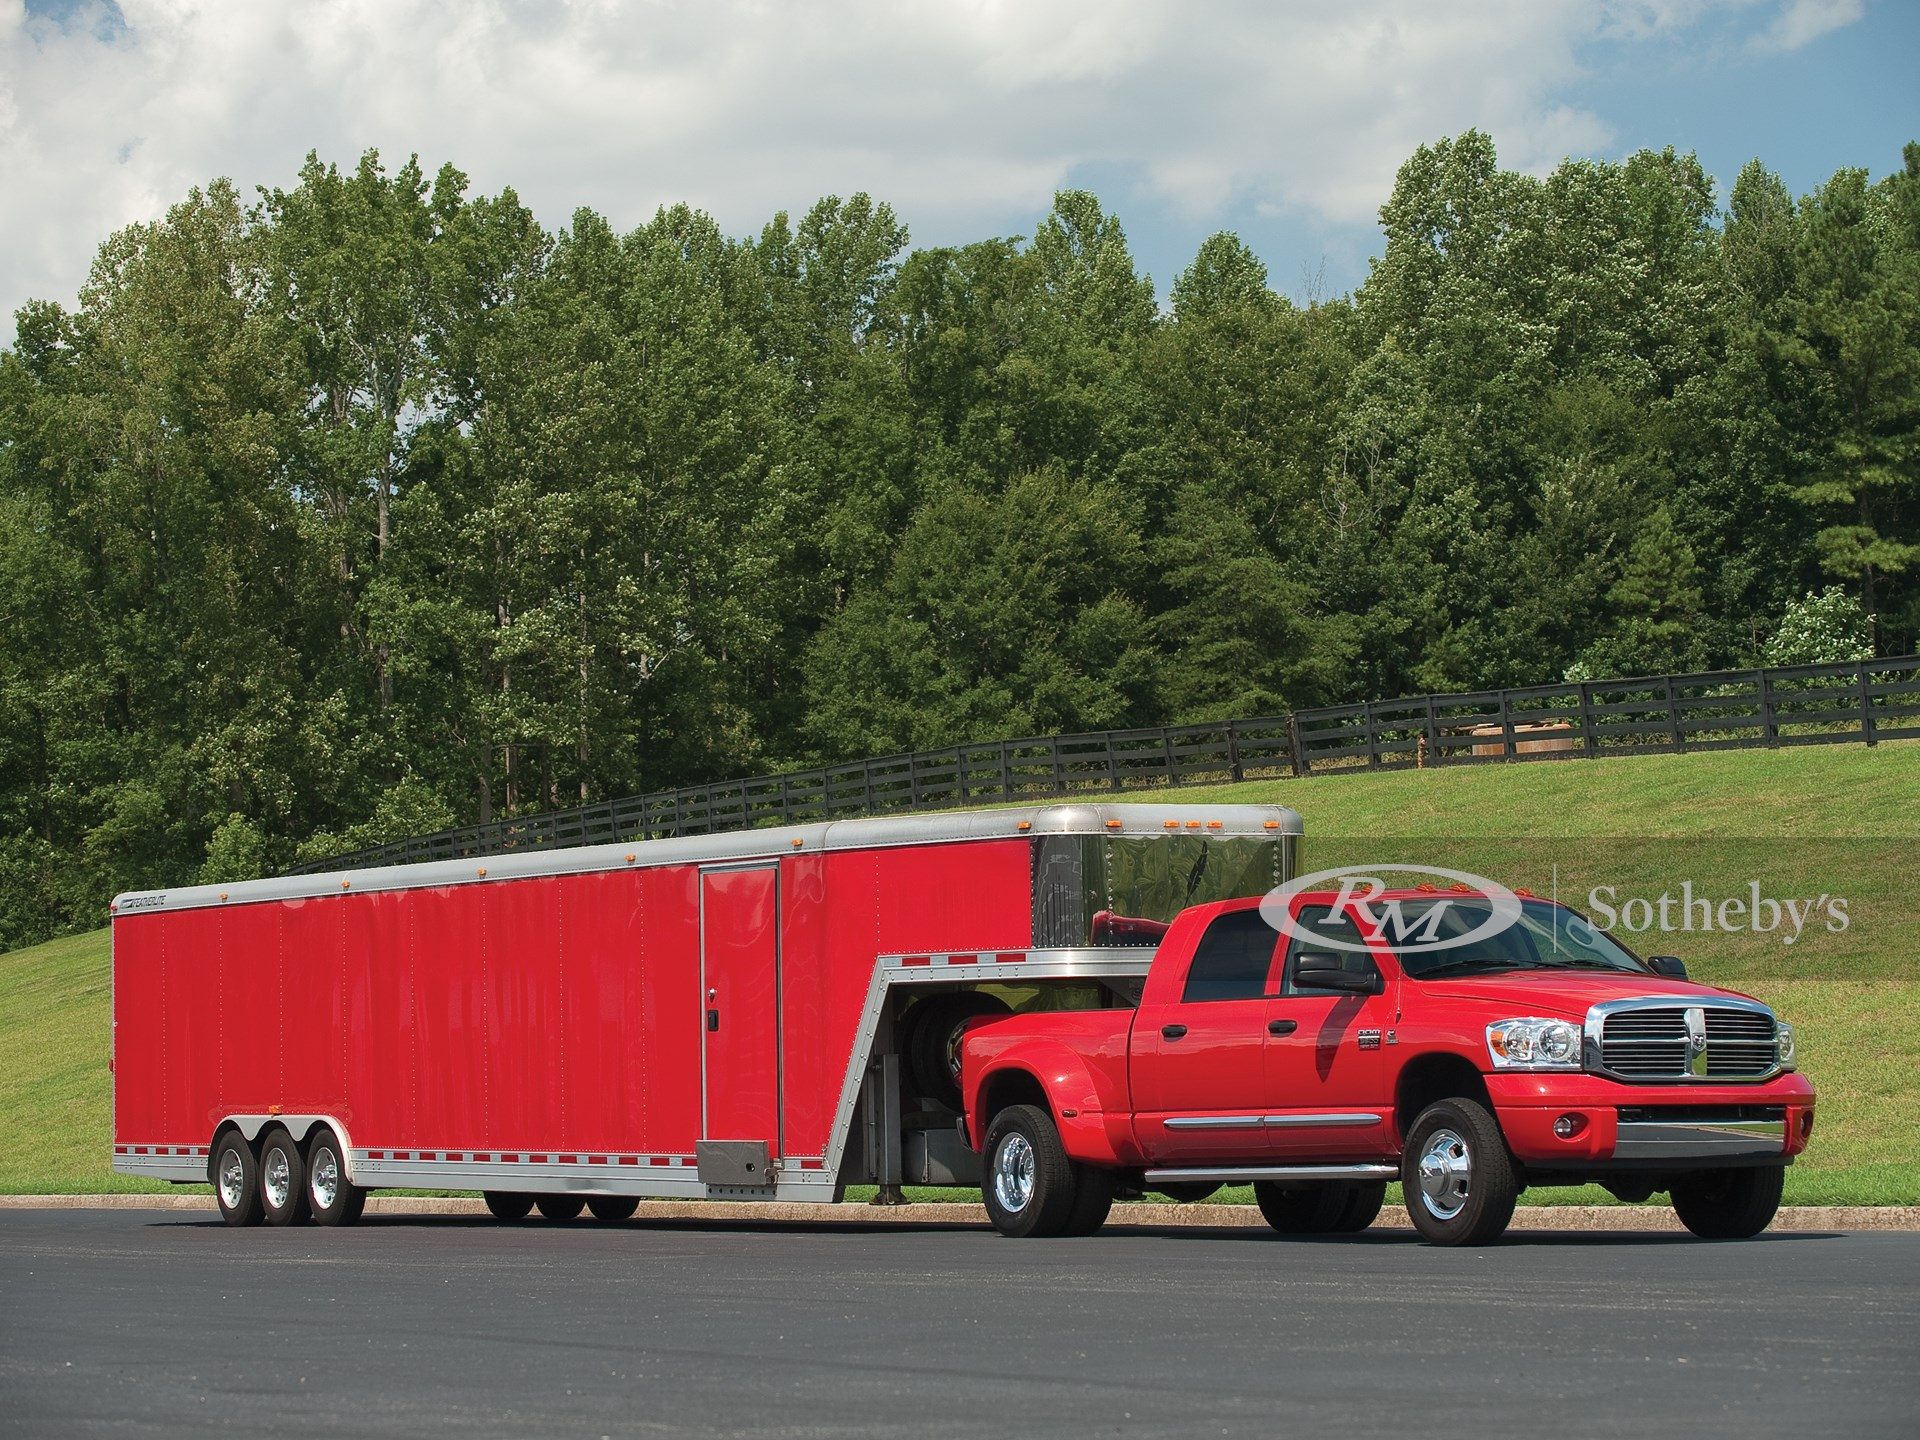 2008 Dodge RAM 3500 Mega Truck & Featherlite Aluminum